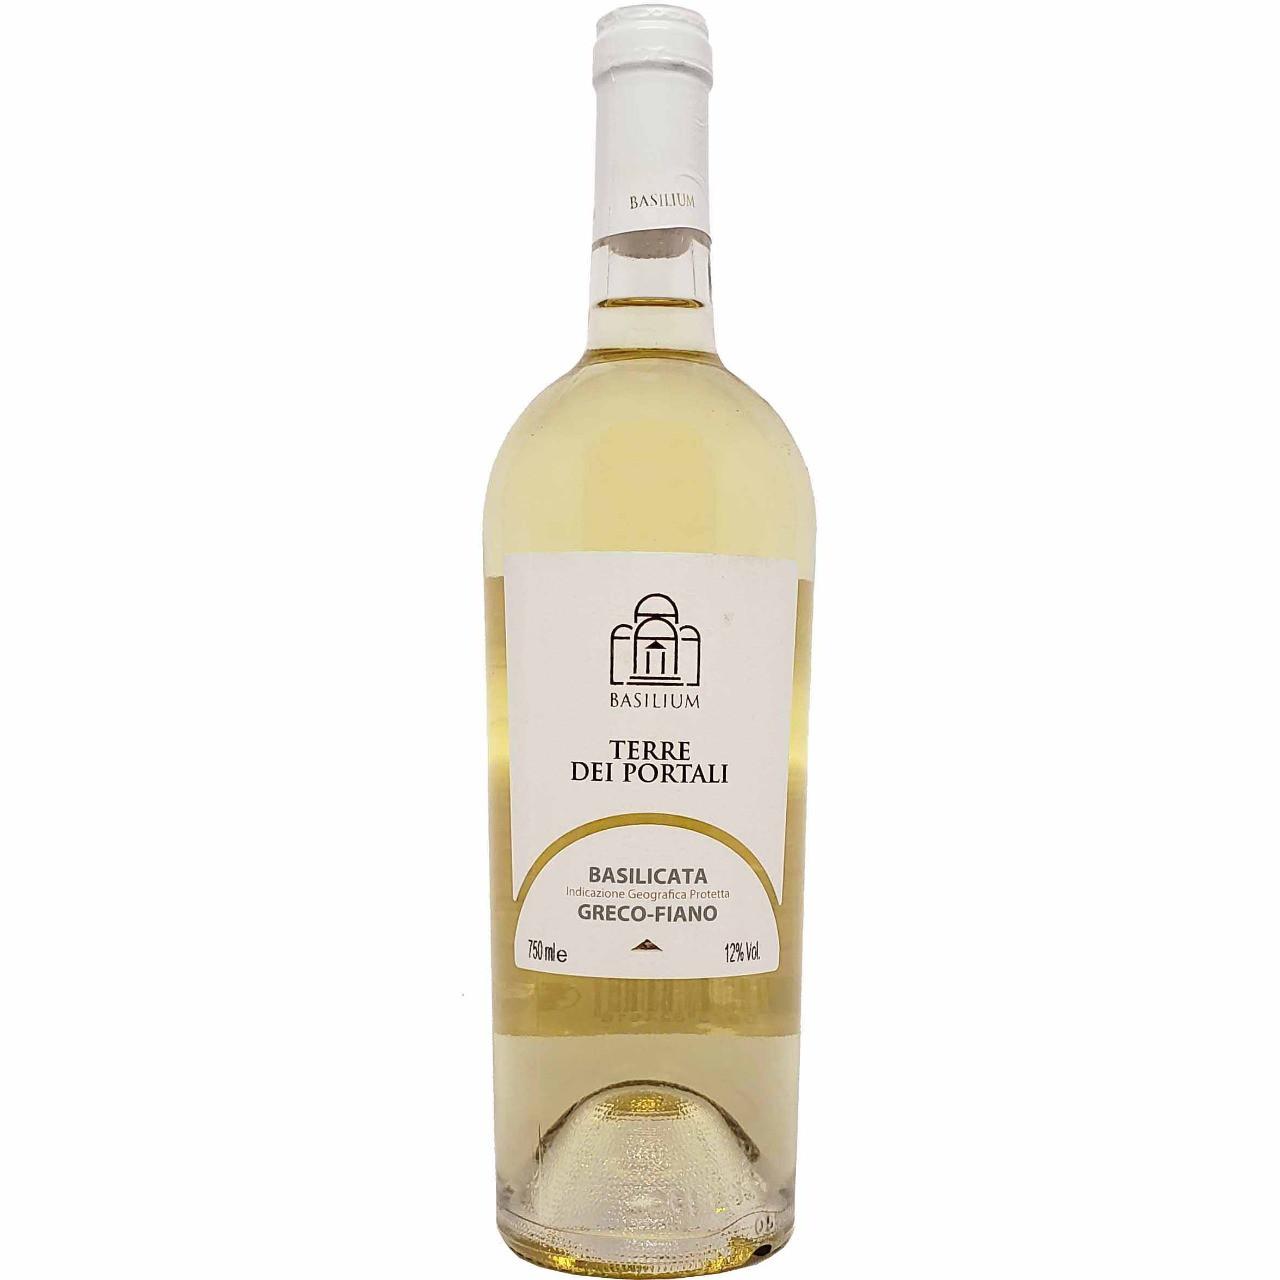 Vinho Branco Terre Dei Portali Basilicata Basilium - 750ml -